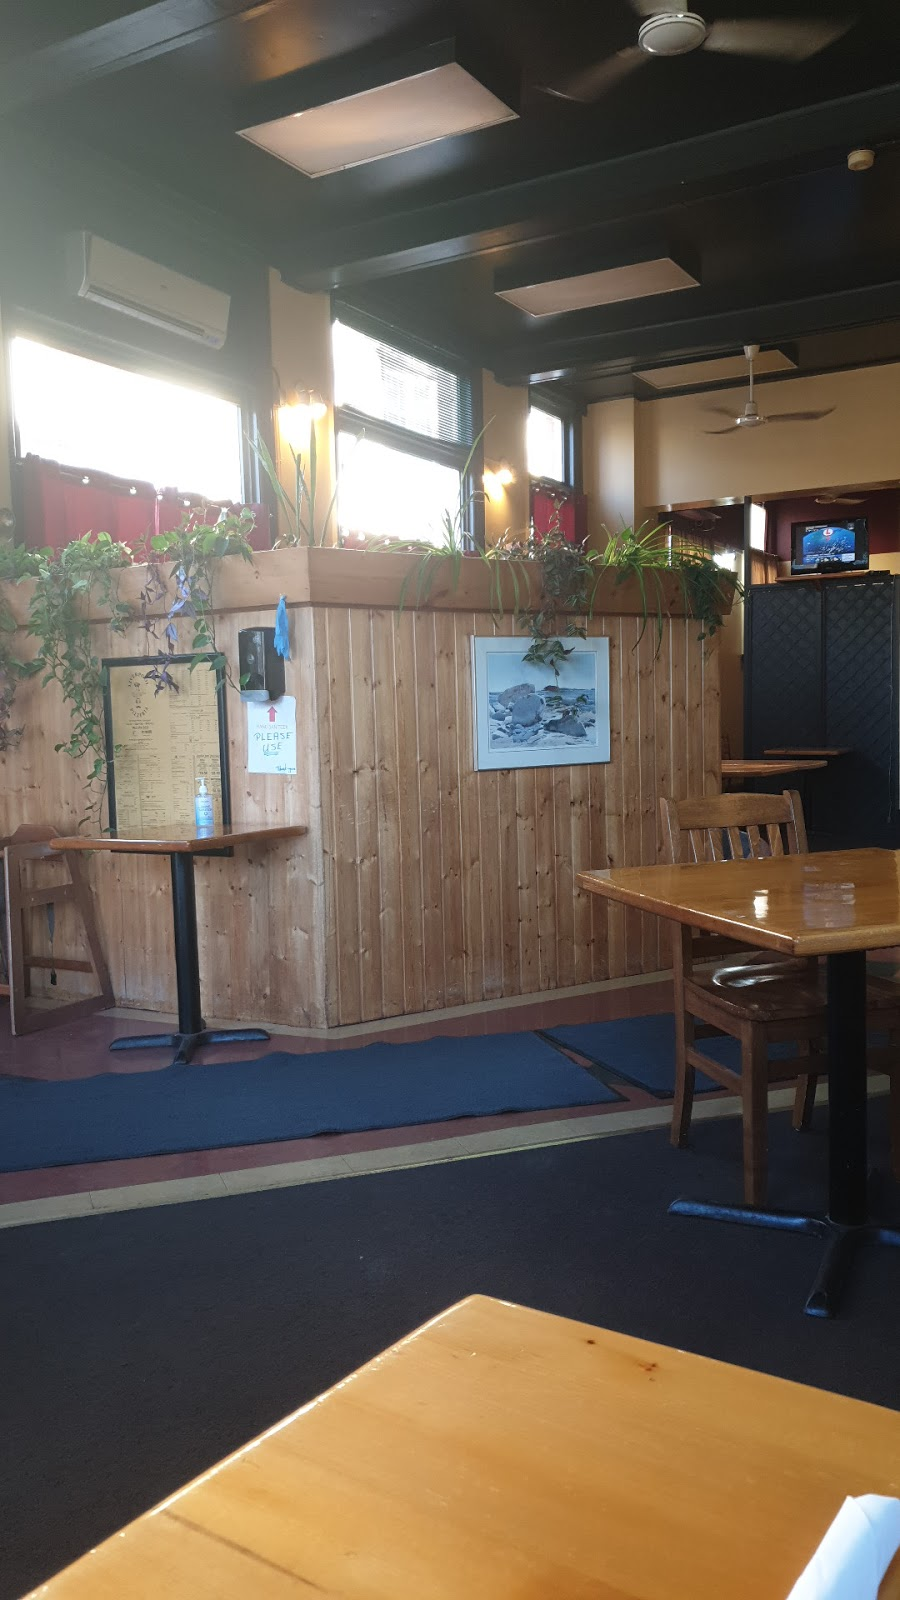 Liverpool Pizzeria   restaurant   155 Main St, Liverpool, NS B0T 1K0, Canada   9023542422 OR +1 902-354-2422